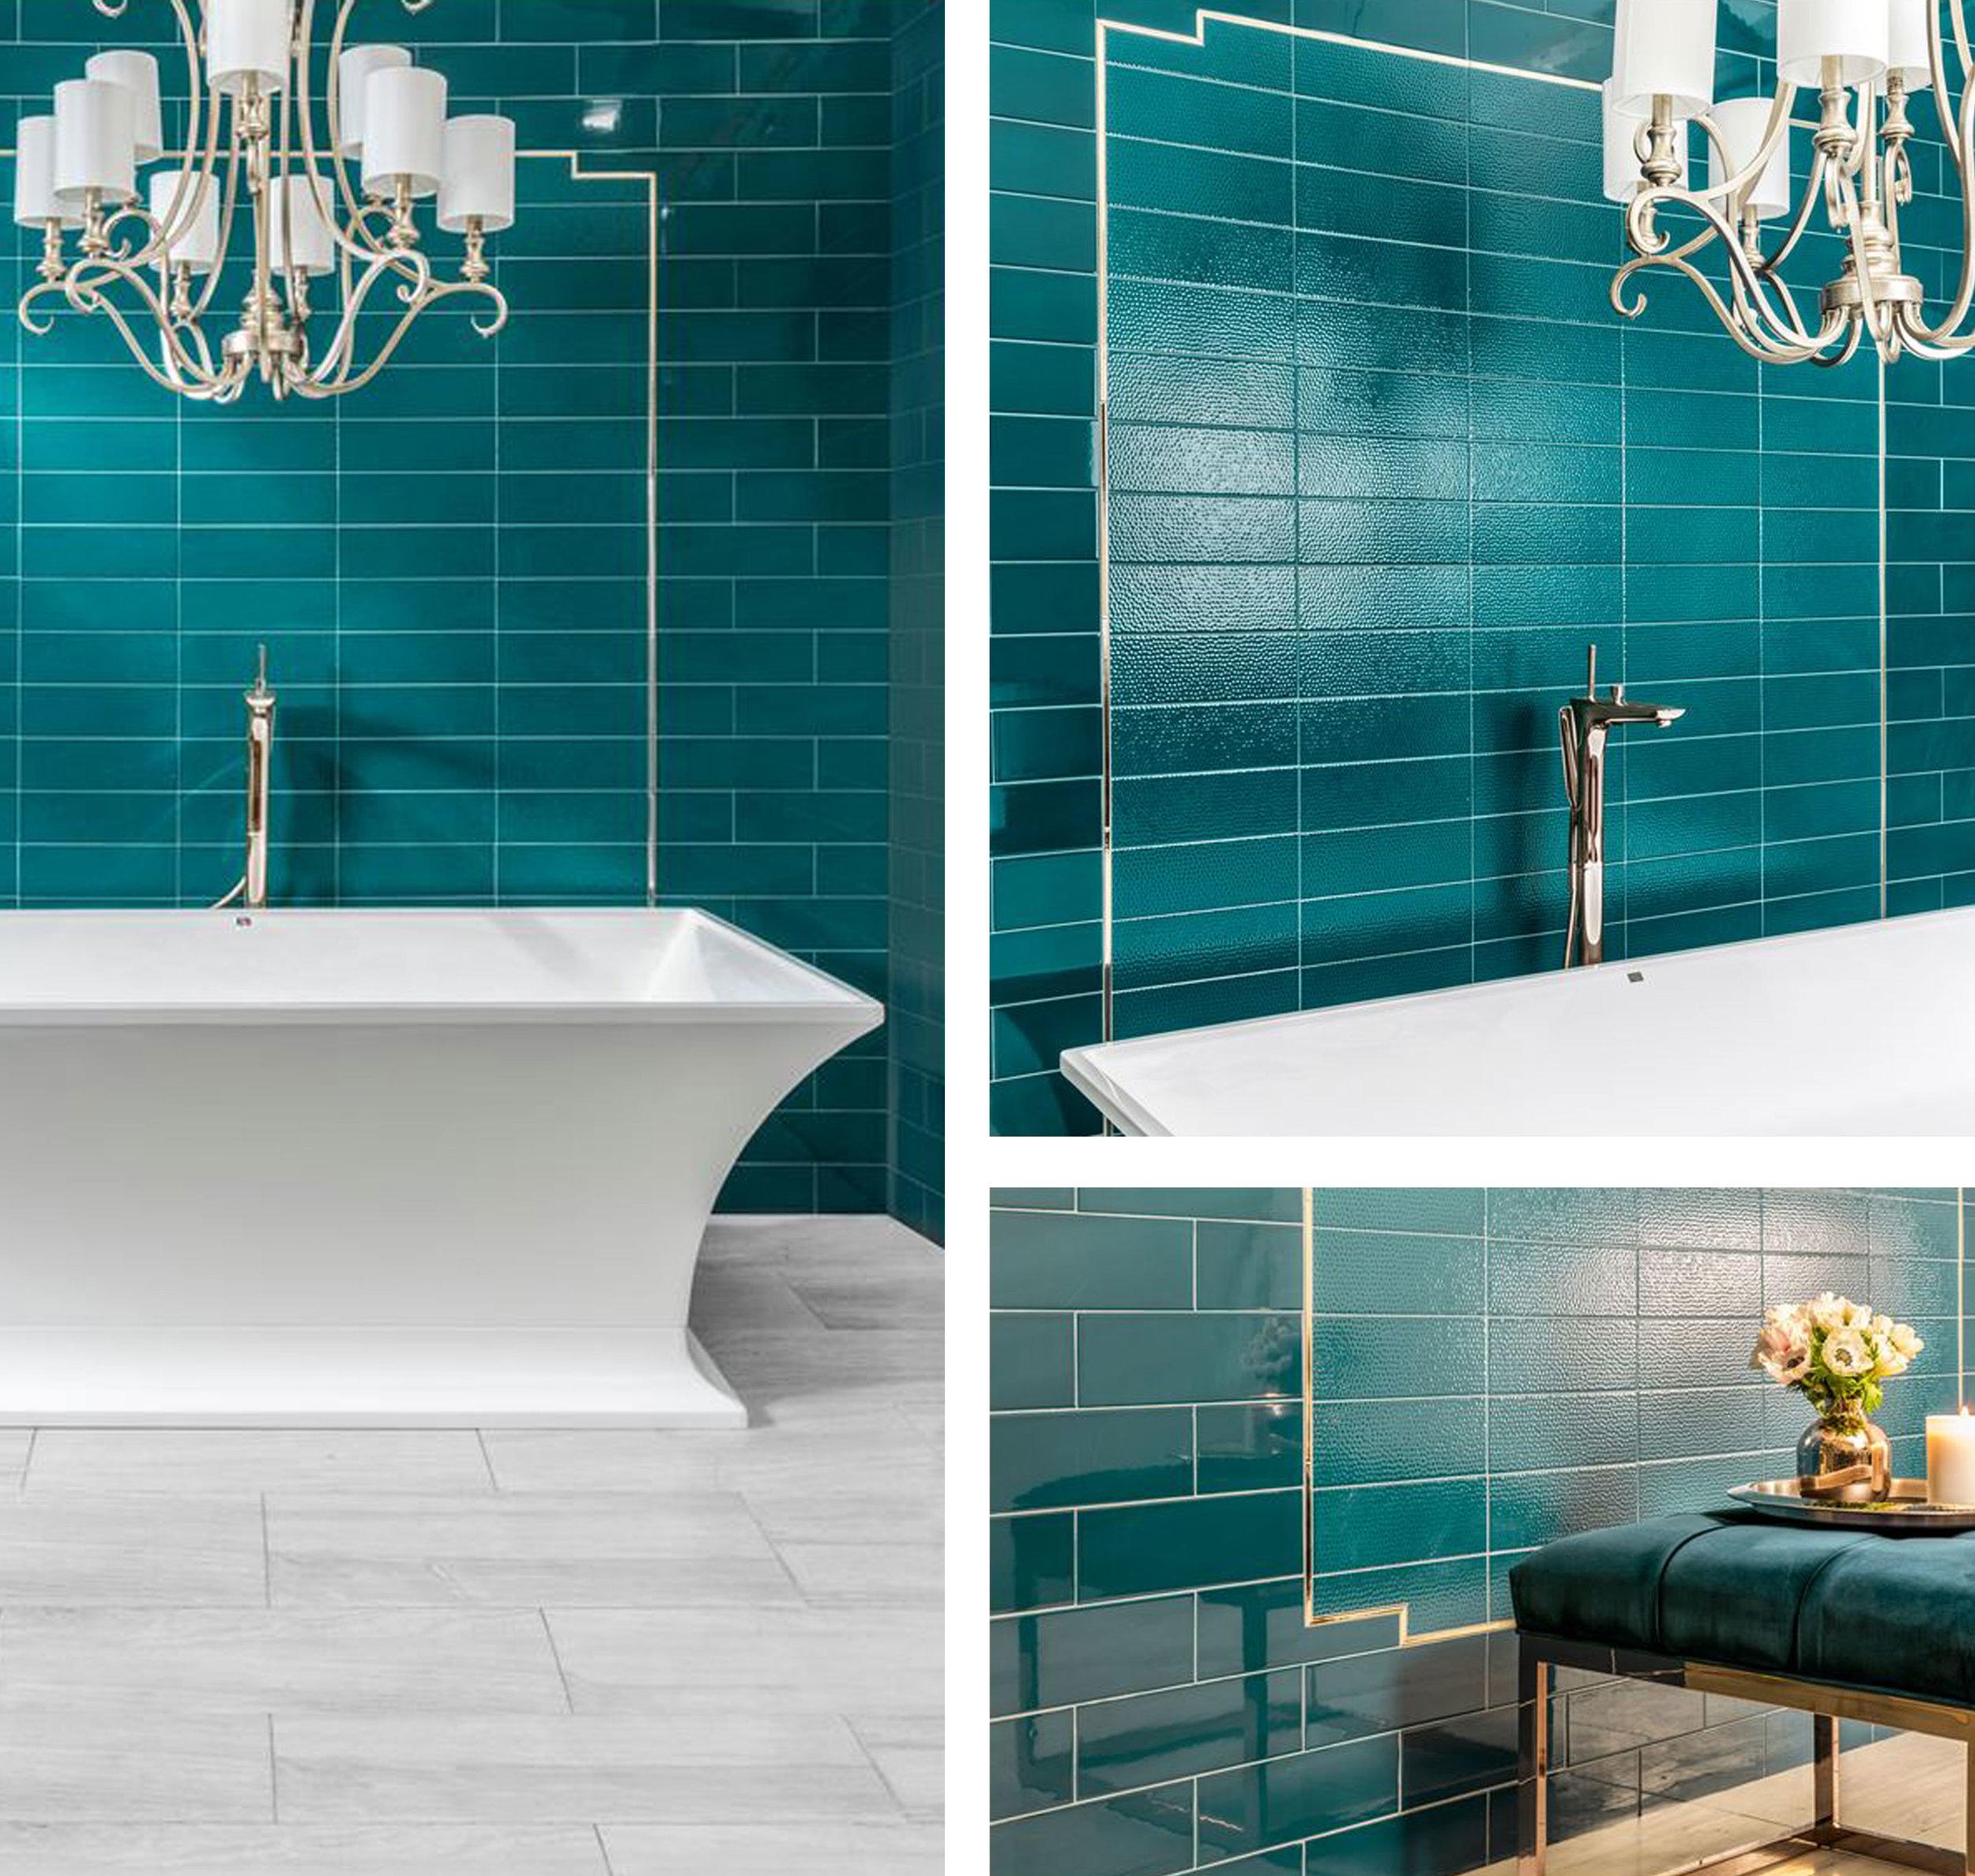 3 ways to incorporate aqua tiles into your home — Divine Design+Build